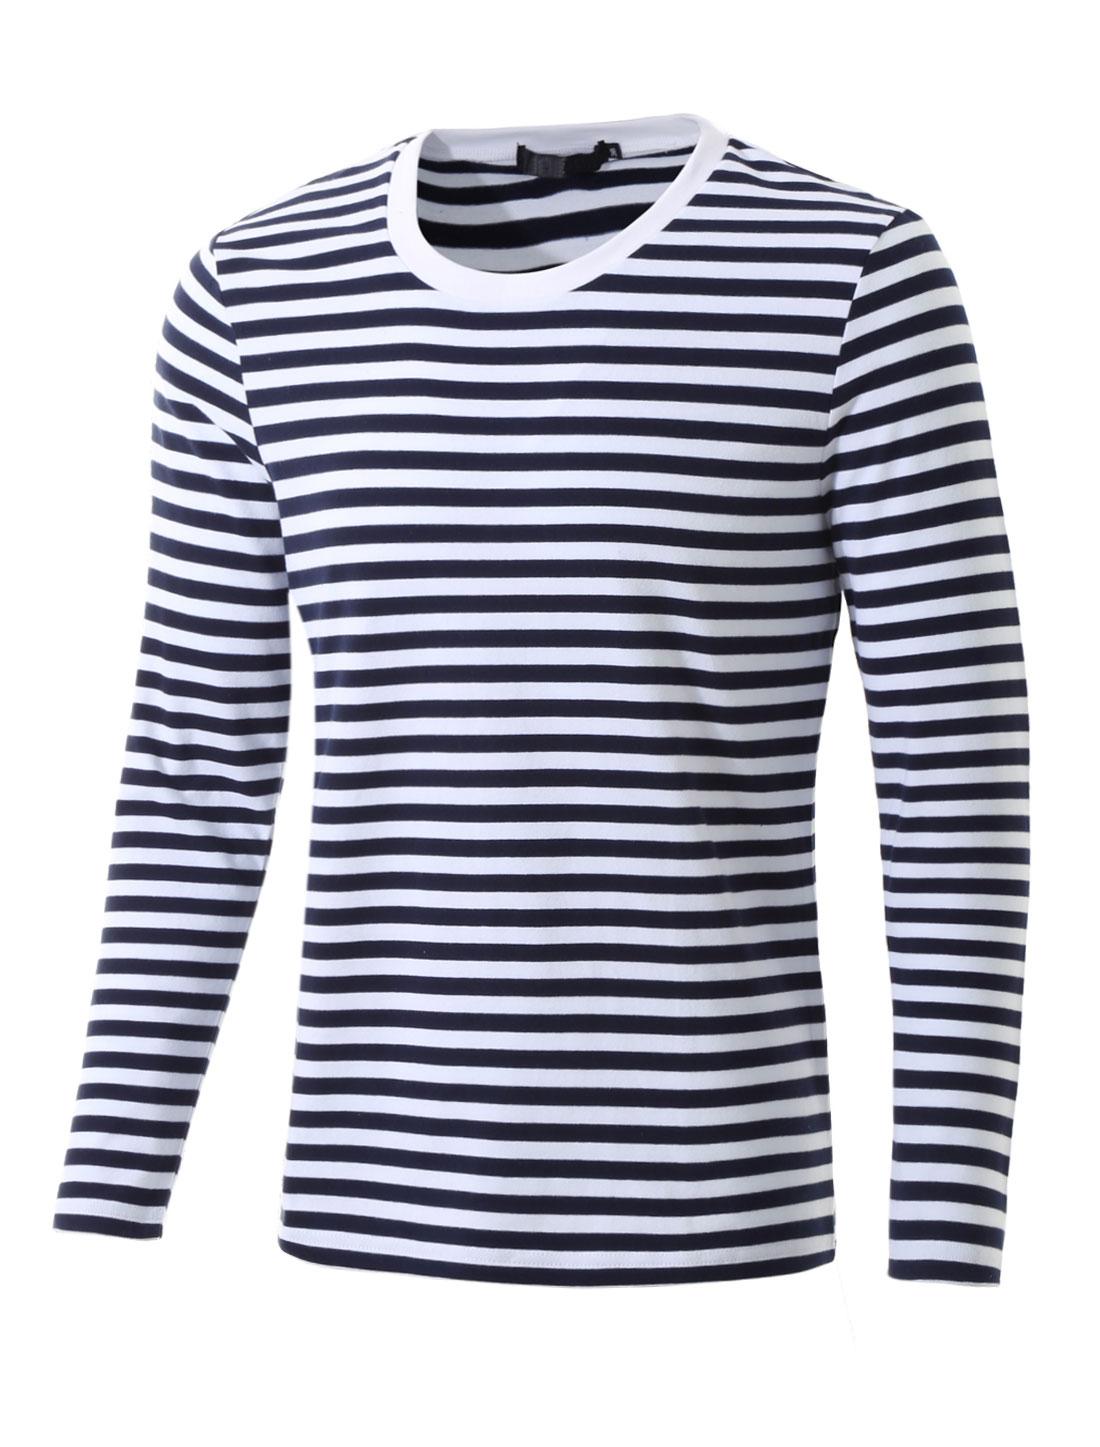 Men Crew Neck Long Sleeve Striped Tee T Shirt Navy Blue S S (US 36)